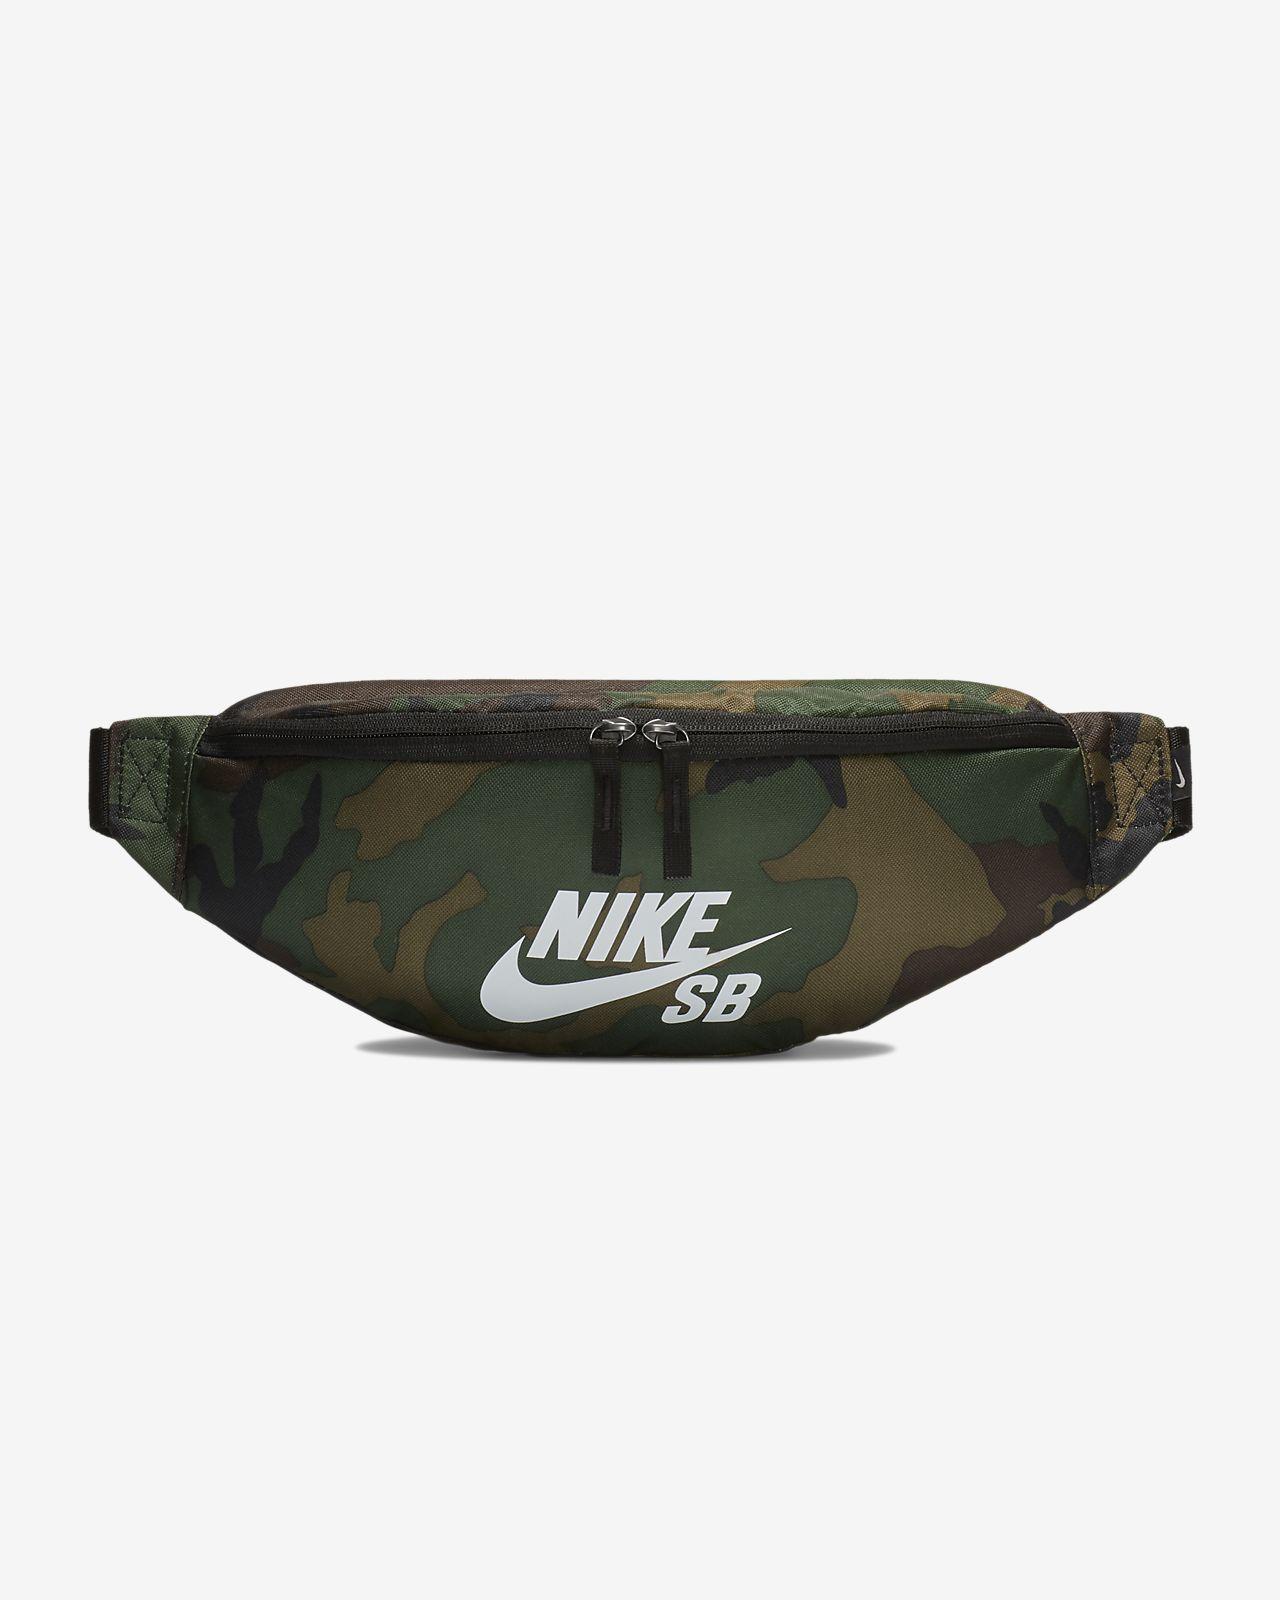 Bolsa de cintura estampada para skateboard Nike SB Heritage (objetos pequenos)